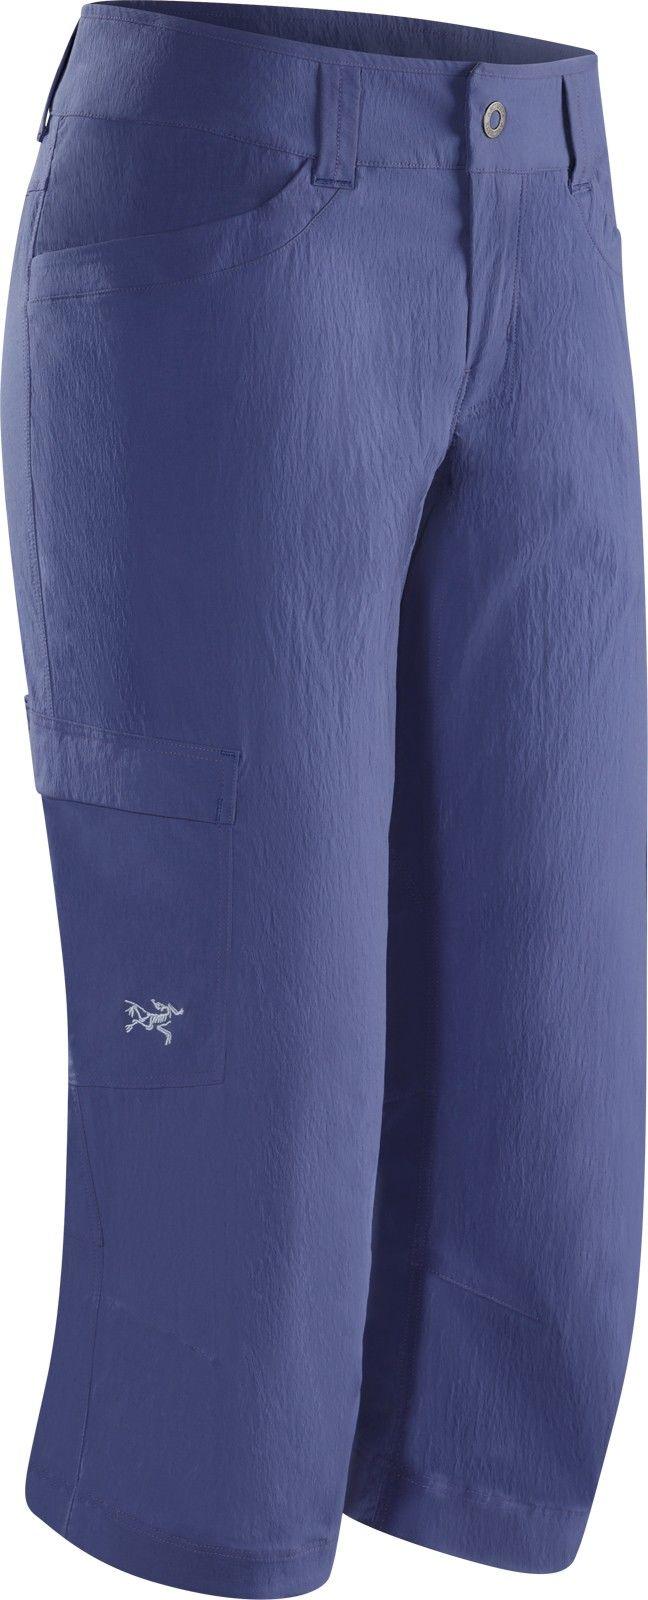 Arcteryx W Parapet Capri | Größe 14 | Damen 3/4-Hose